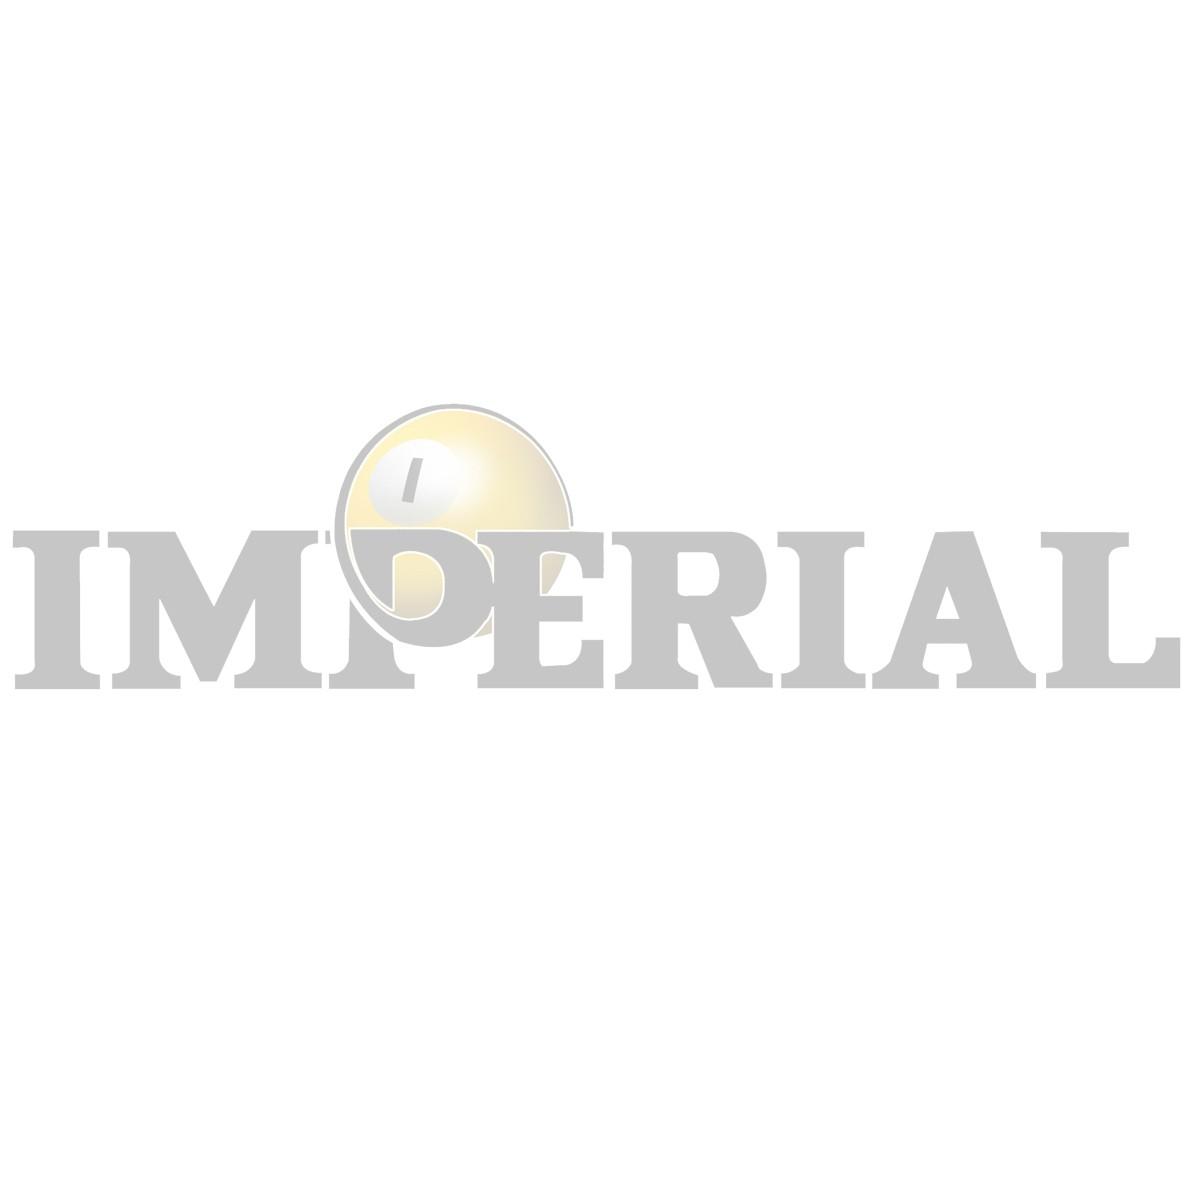 Montreal Canadiens® Home vs. Away Billiard Ball Set